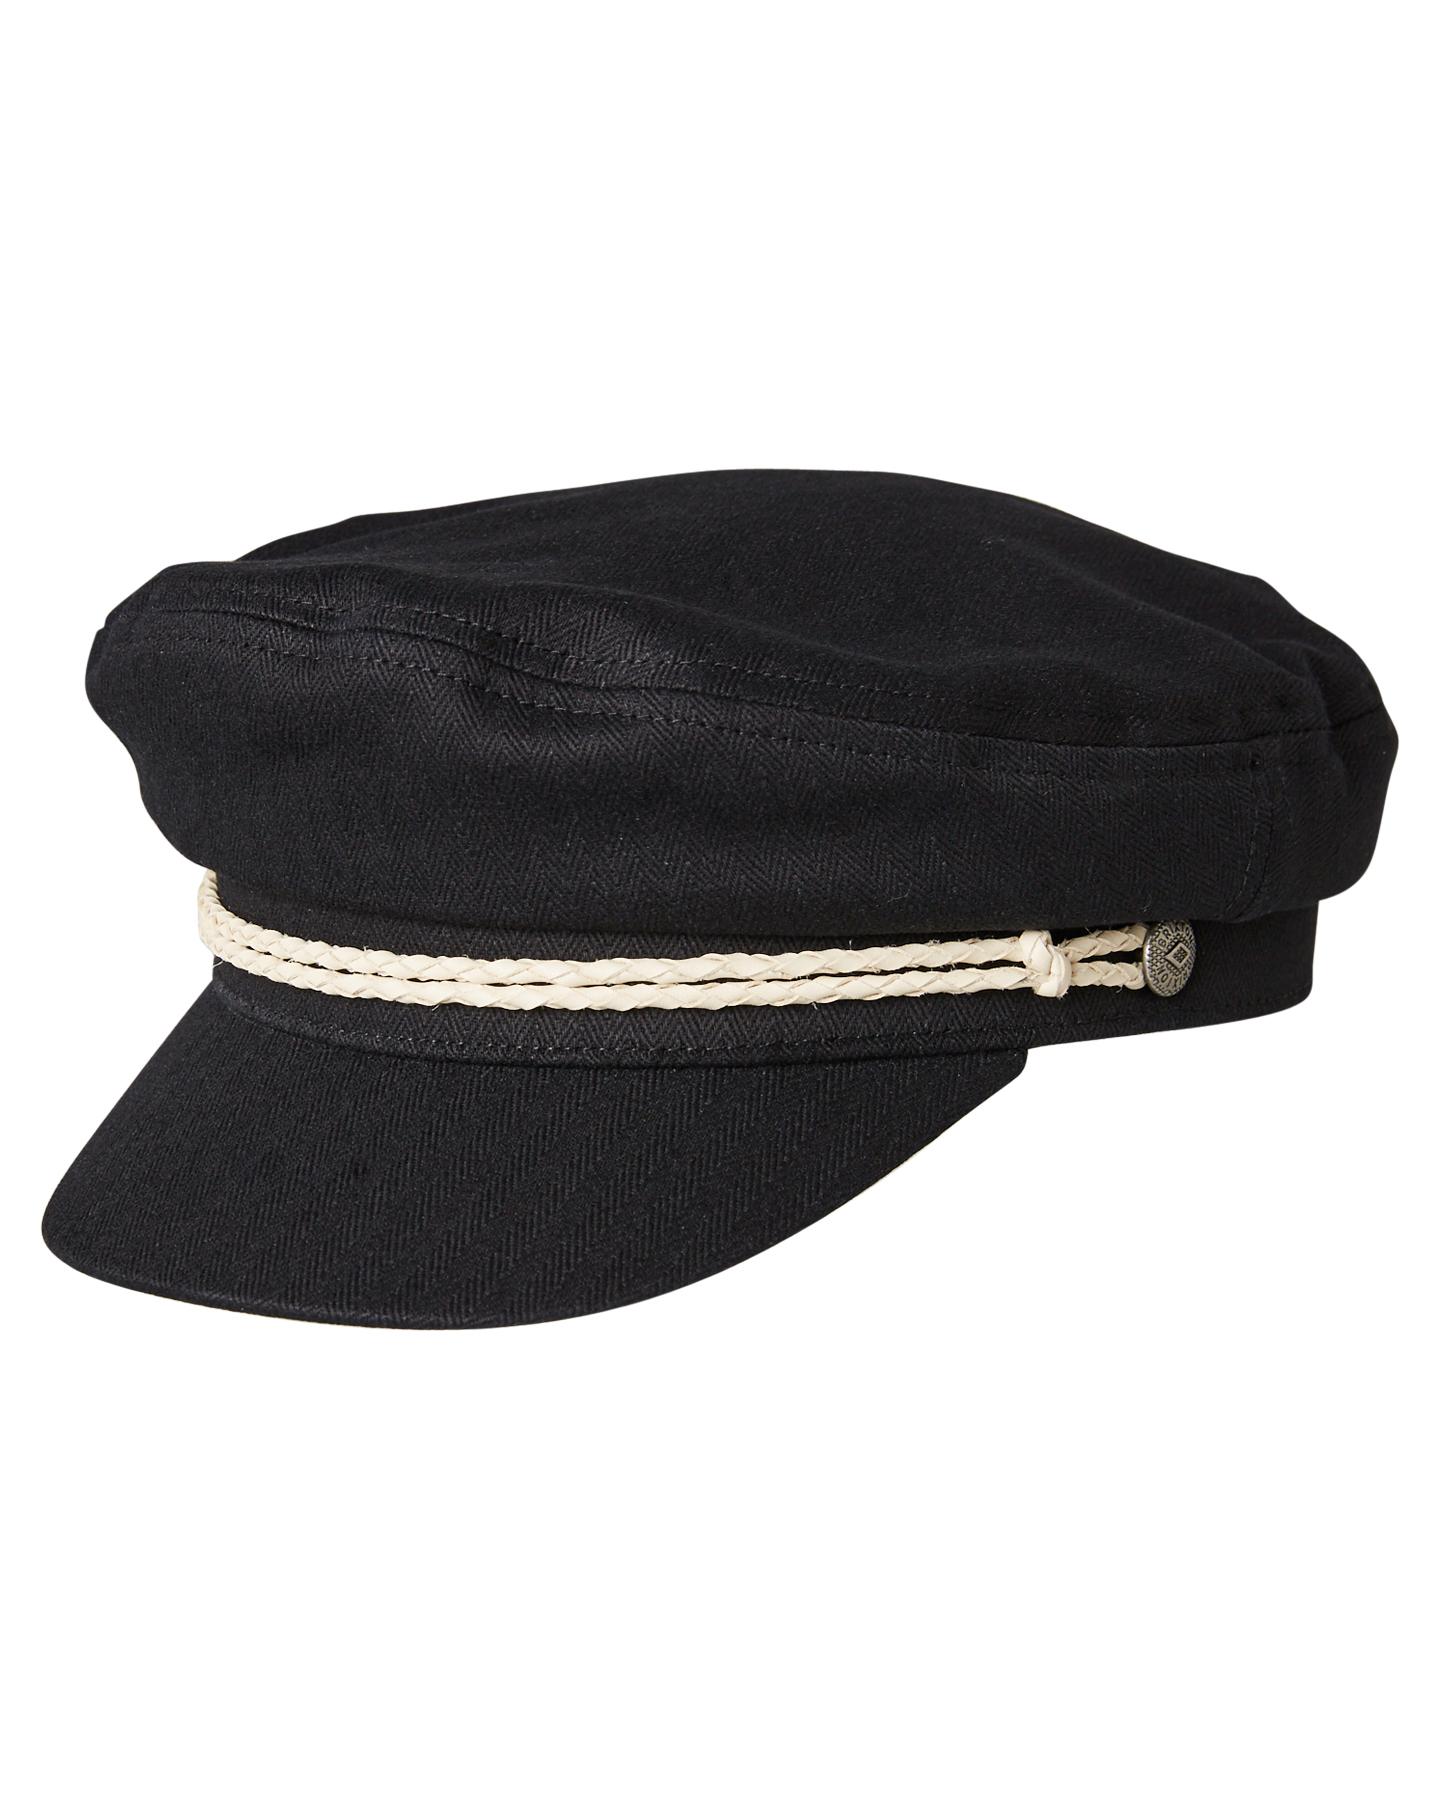 b57188c160d Brixton Ashland Cap - Black Off White